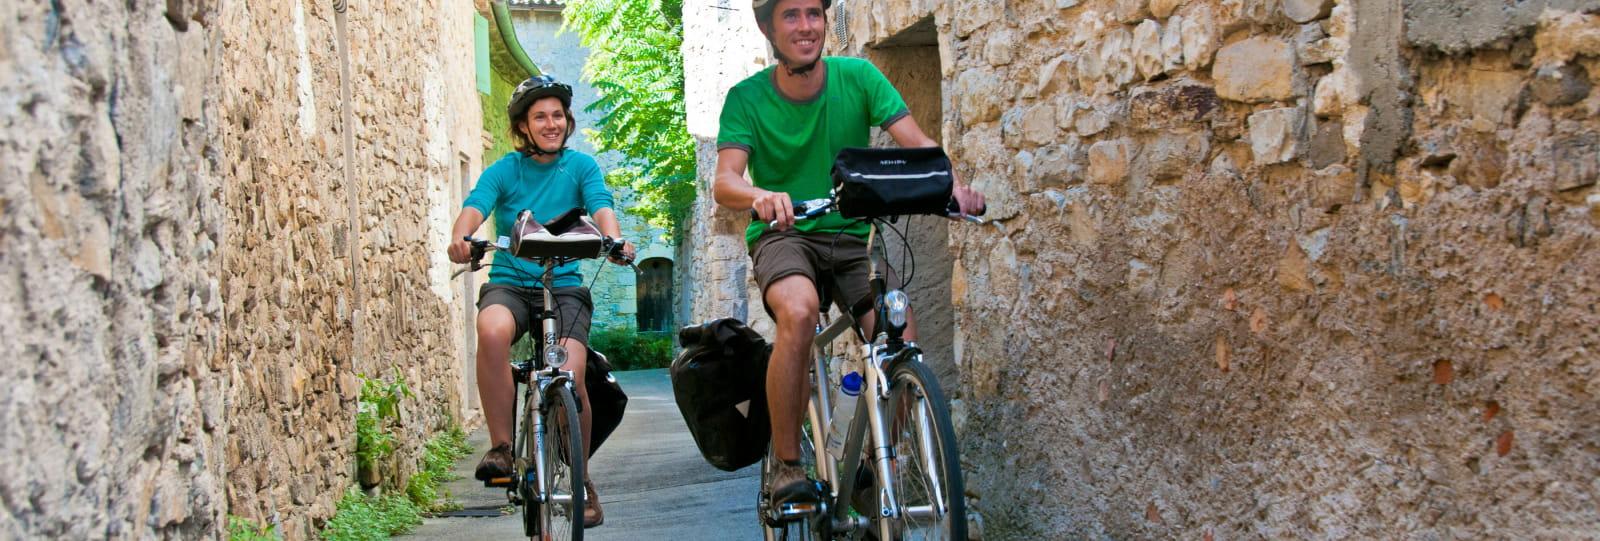 Cycling in Drôme, from Bourdeaux to Drôme Provençale